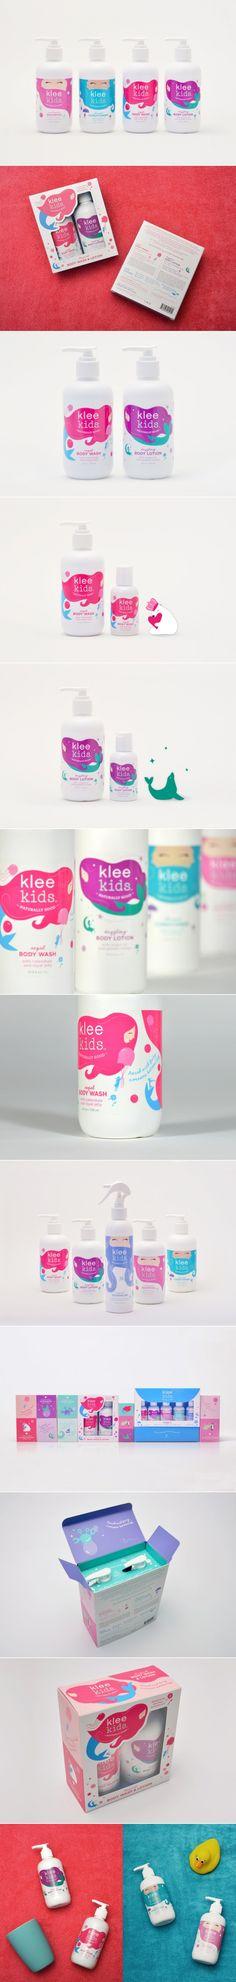 Klee Kids Is Bringing Wholesome Ingredients to Bath Time — The Dieline | Packaging & Branding Design & Innovation News